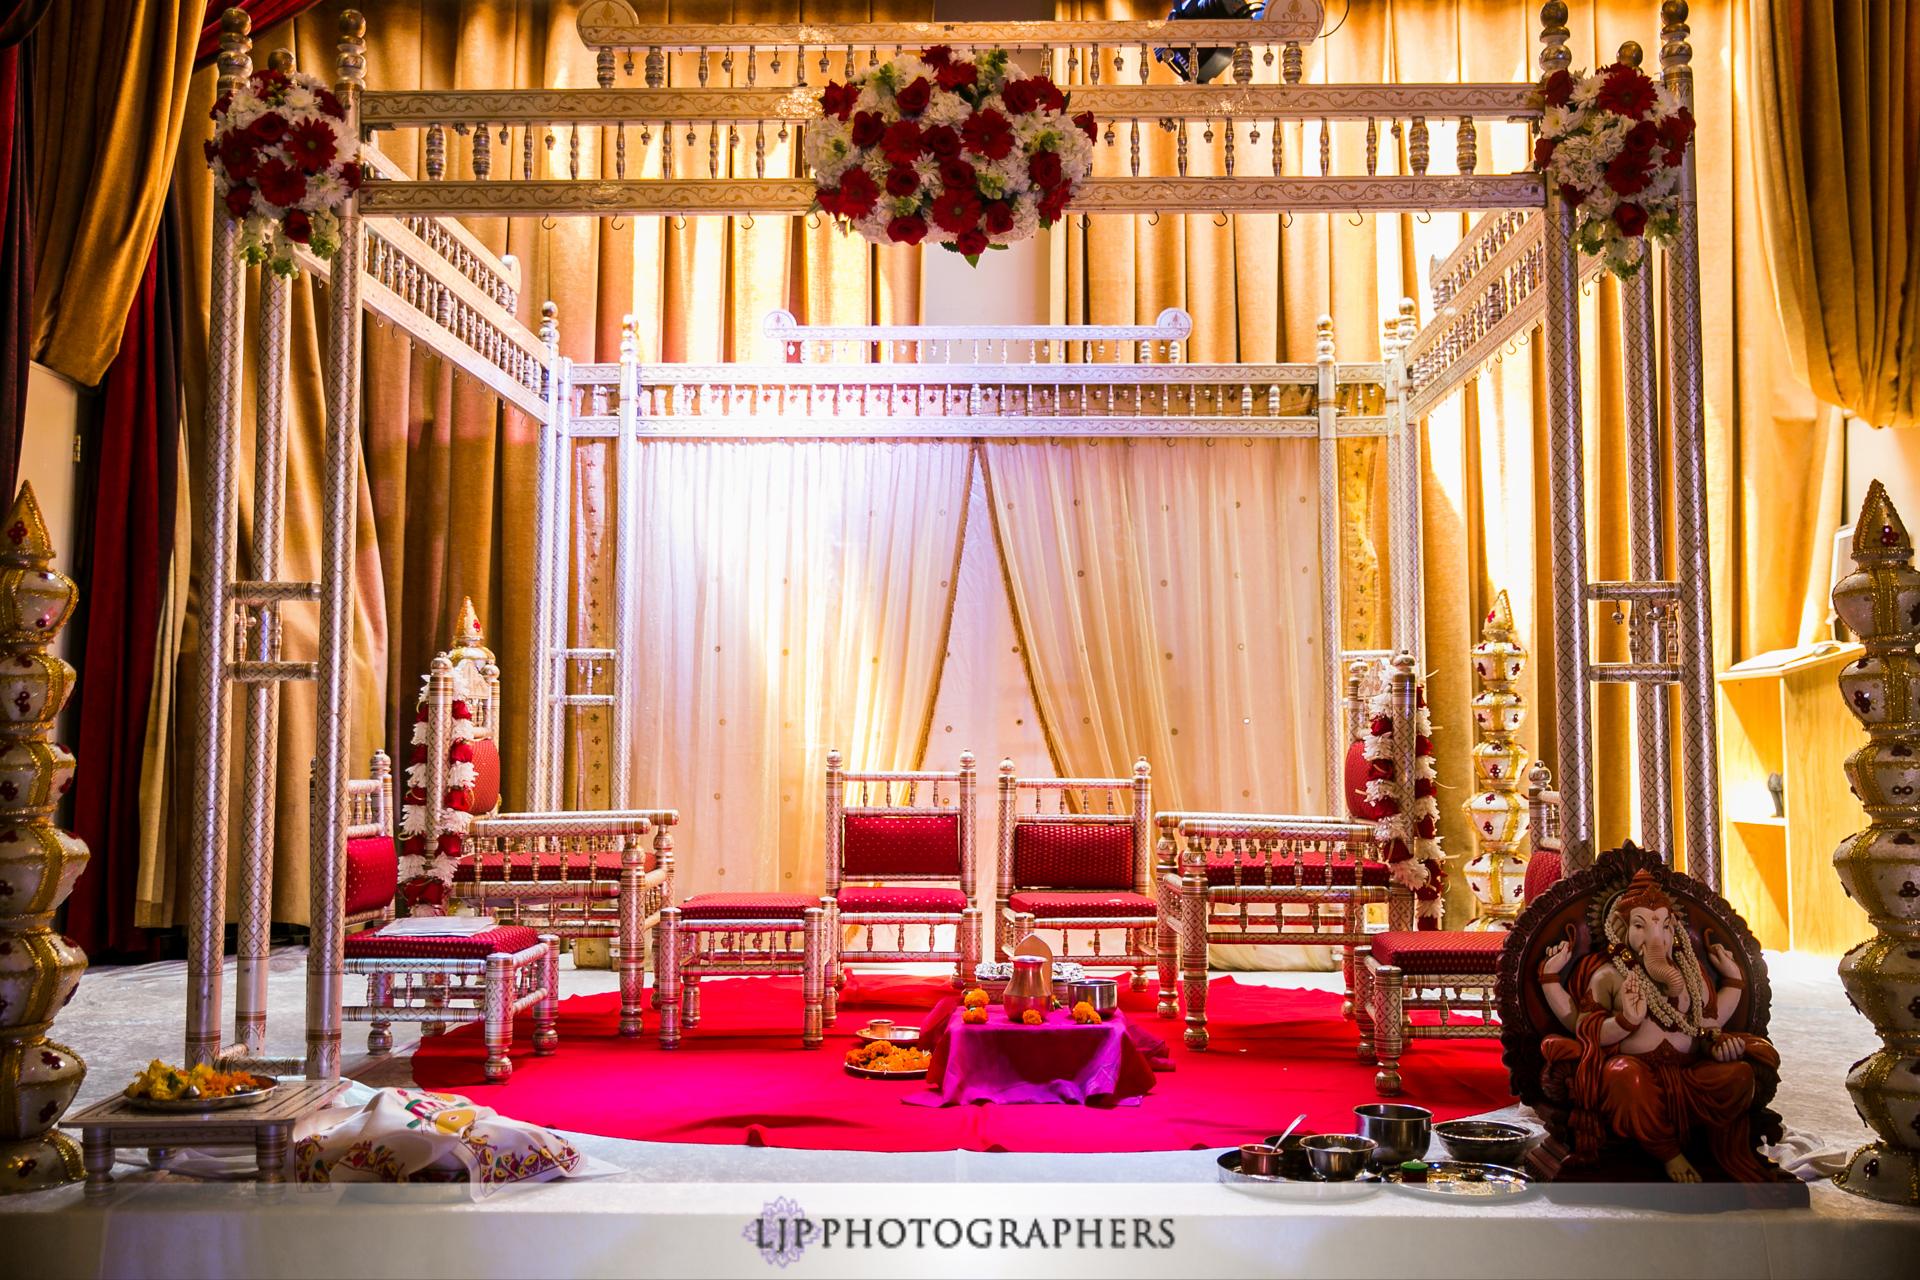 Home Le Foyer Marcinelle : Le foyer ballroom indian wedding ameet and carmen